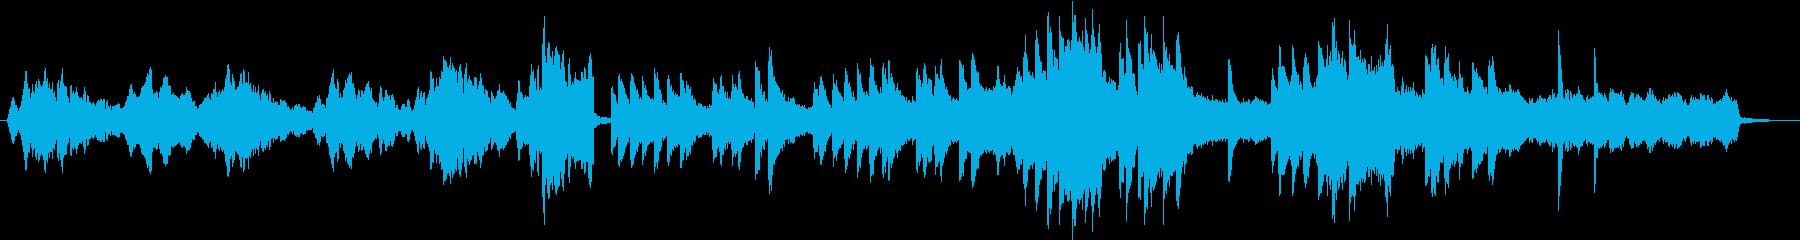 CM・ピアノとストリングス・幻想・切ないの再生済みの波形